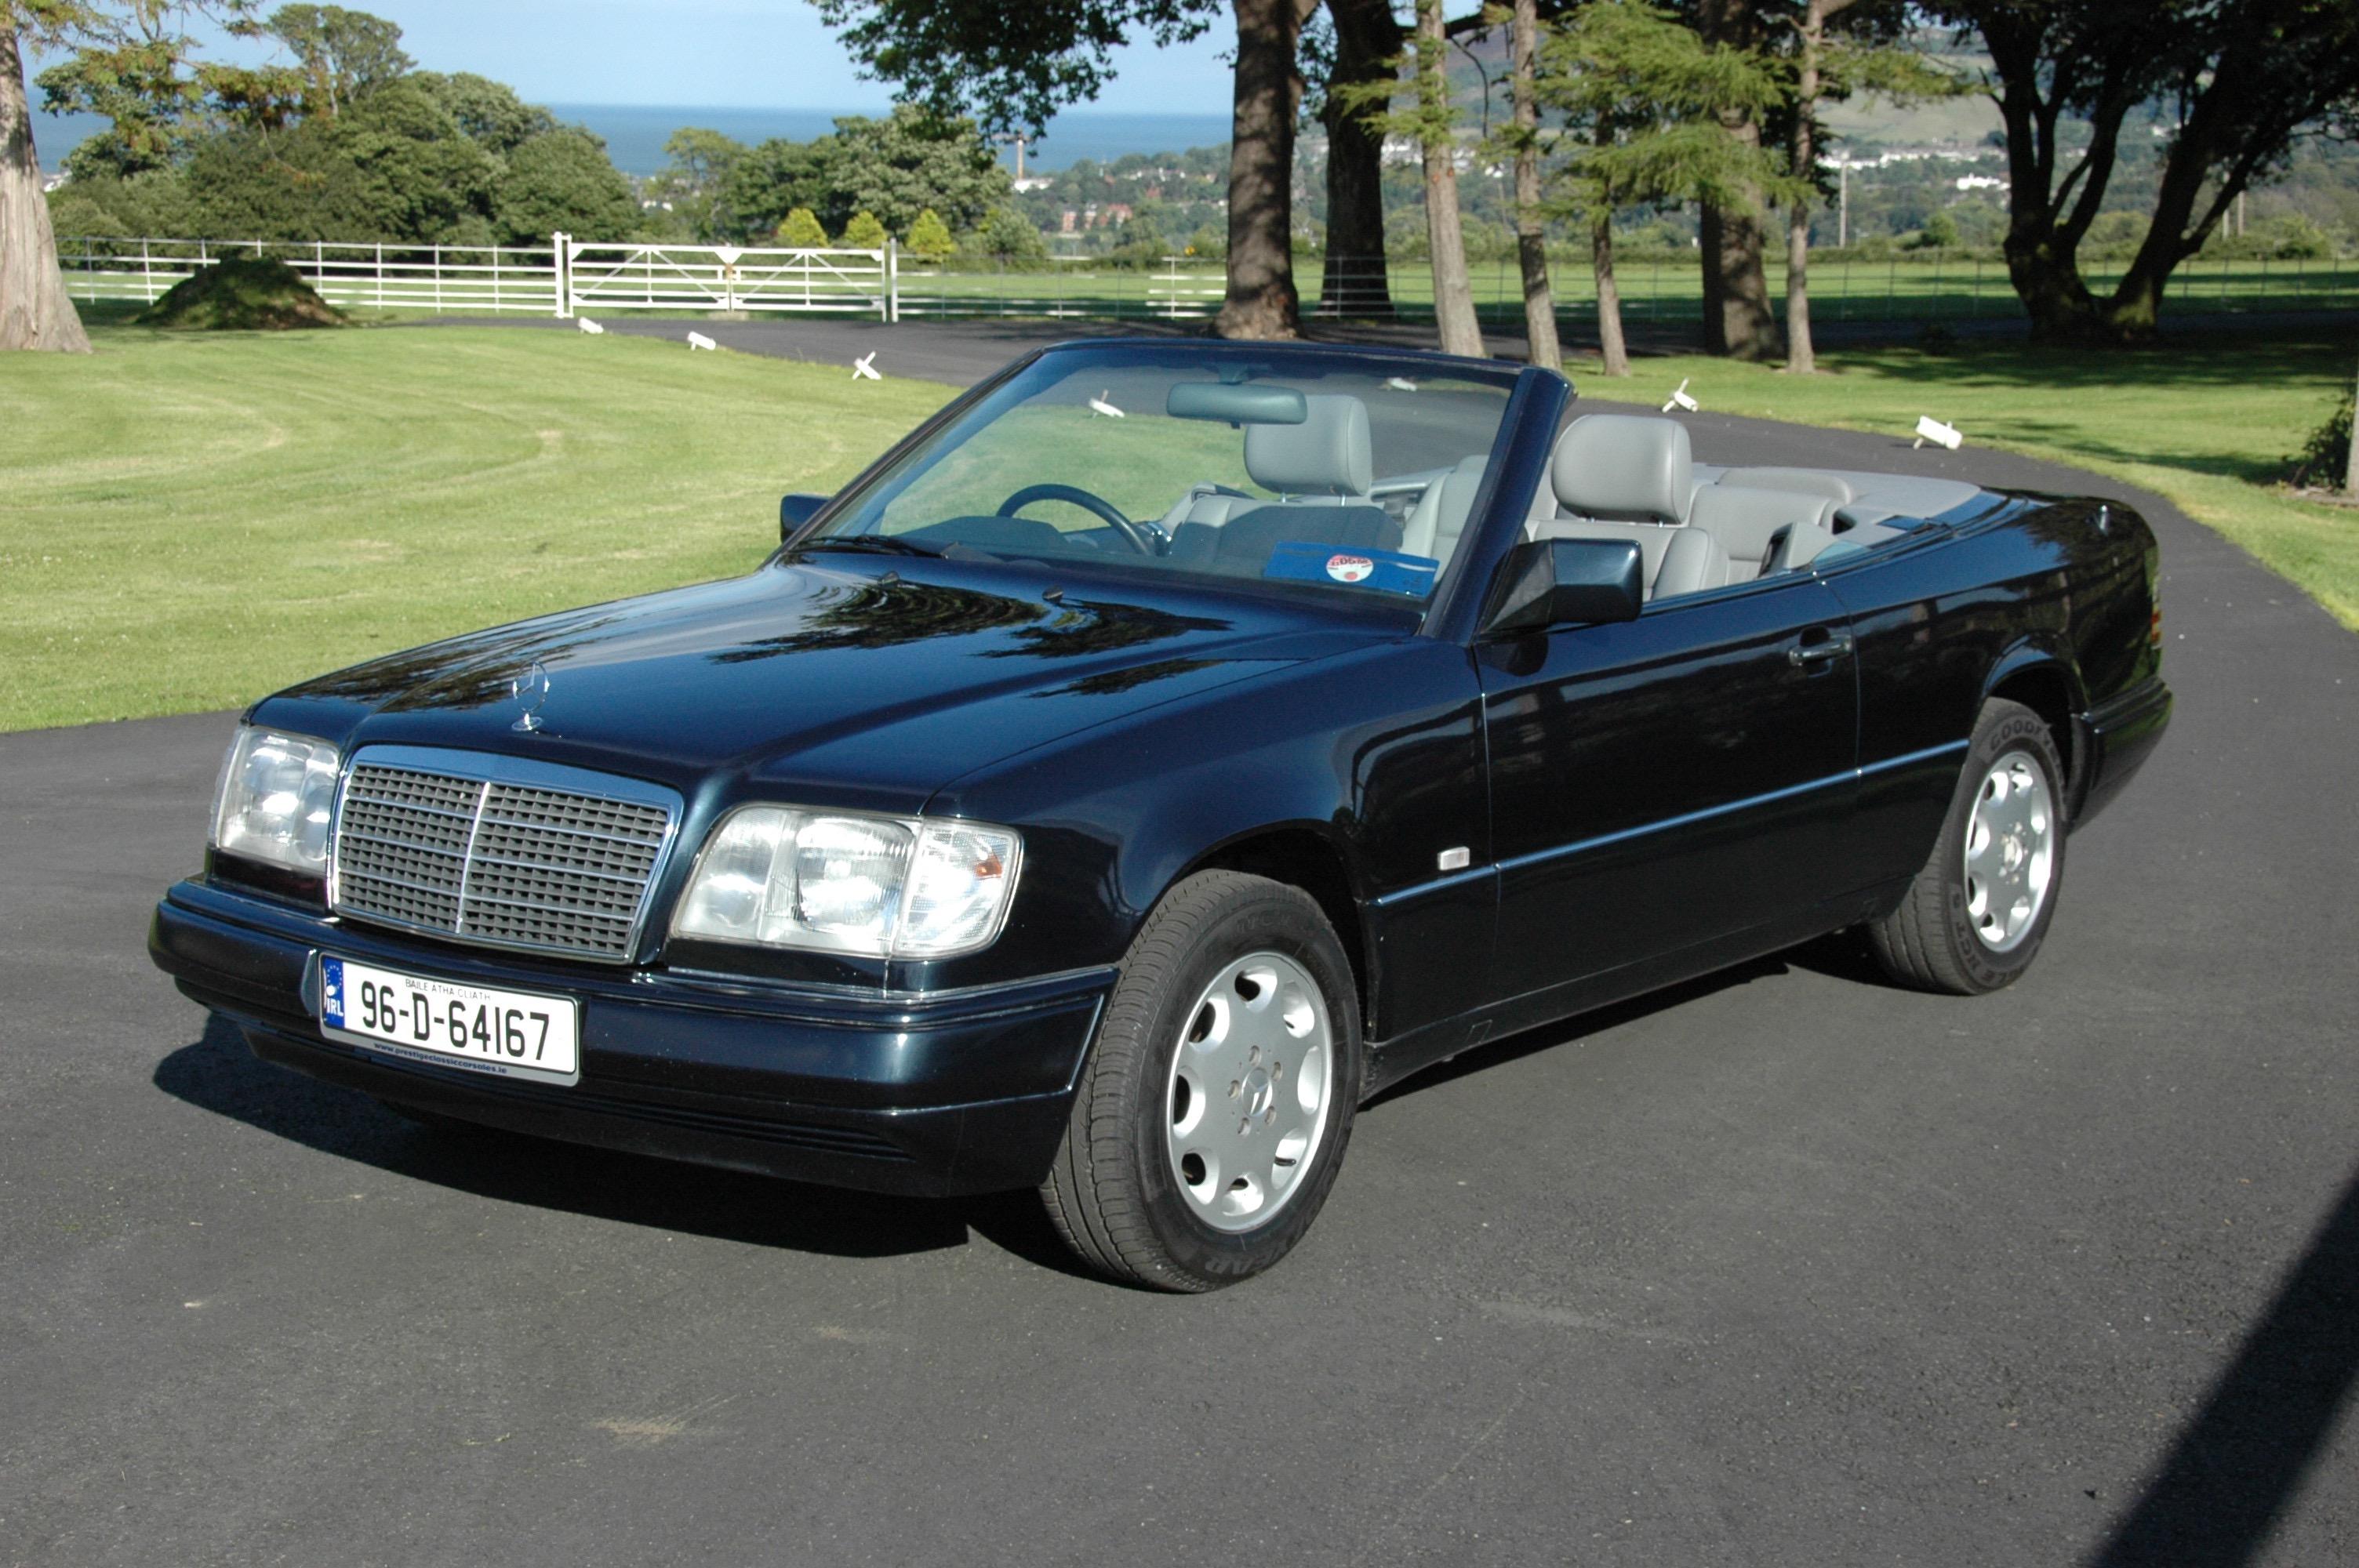 1996 mercedes benz e220 cabriolet w124 prestige classic cars. Black Bedroom Furniture Sets. Home Design Ideas